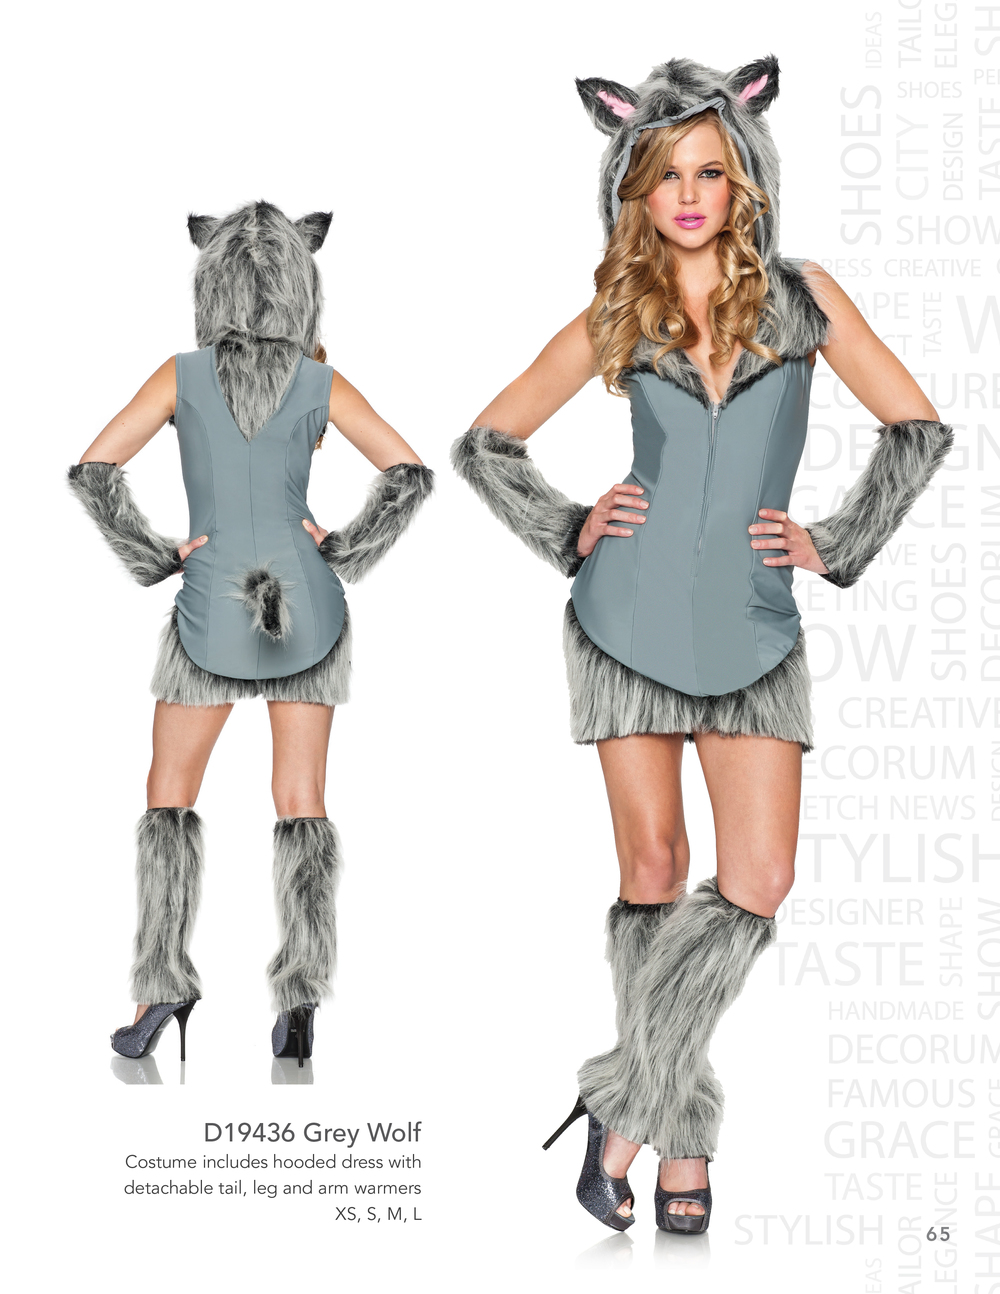 D19436 Grey Wolf